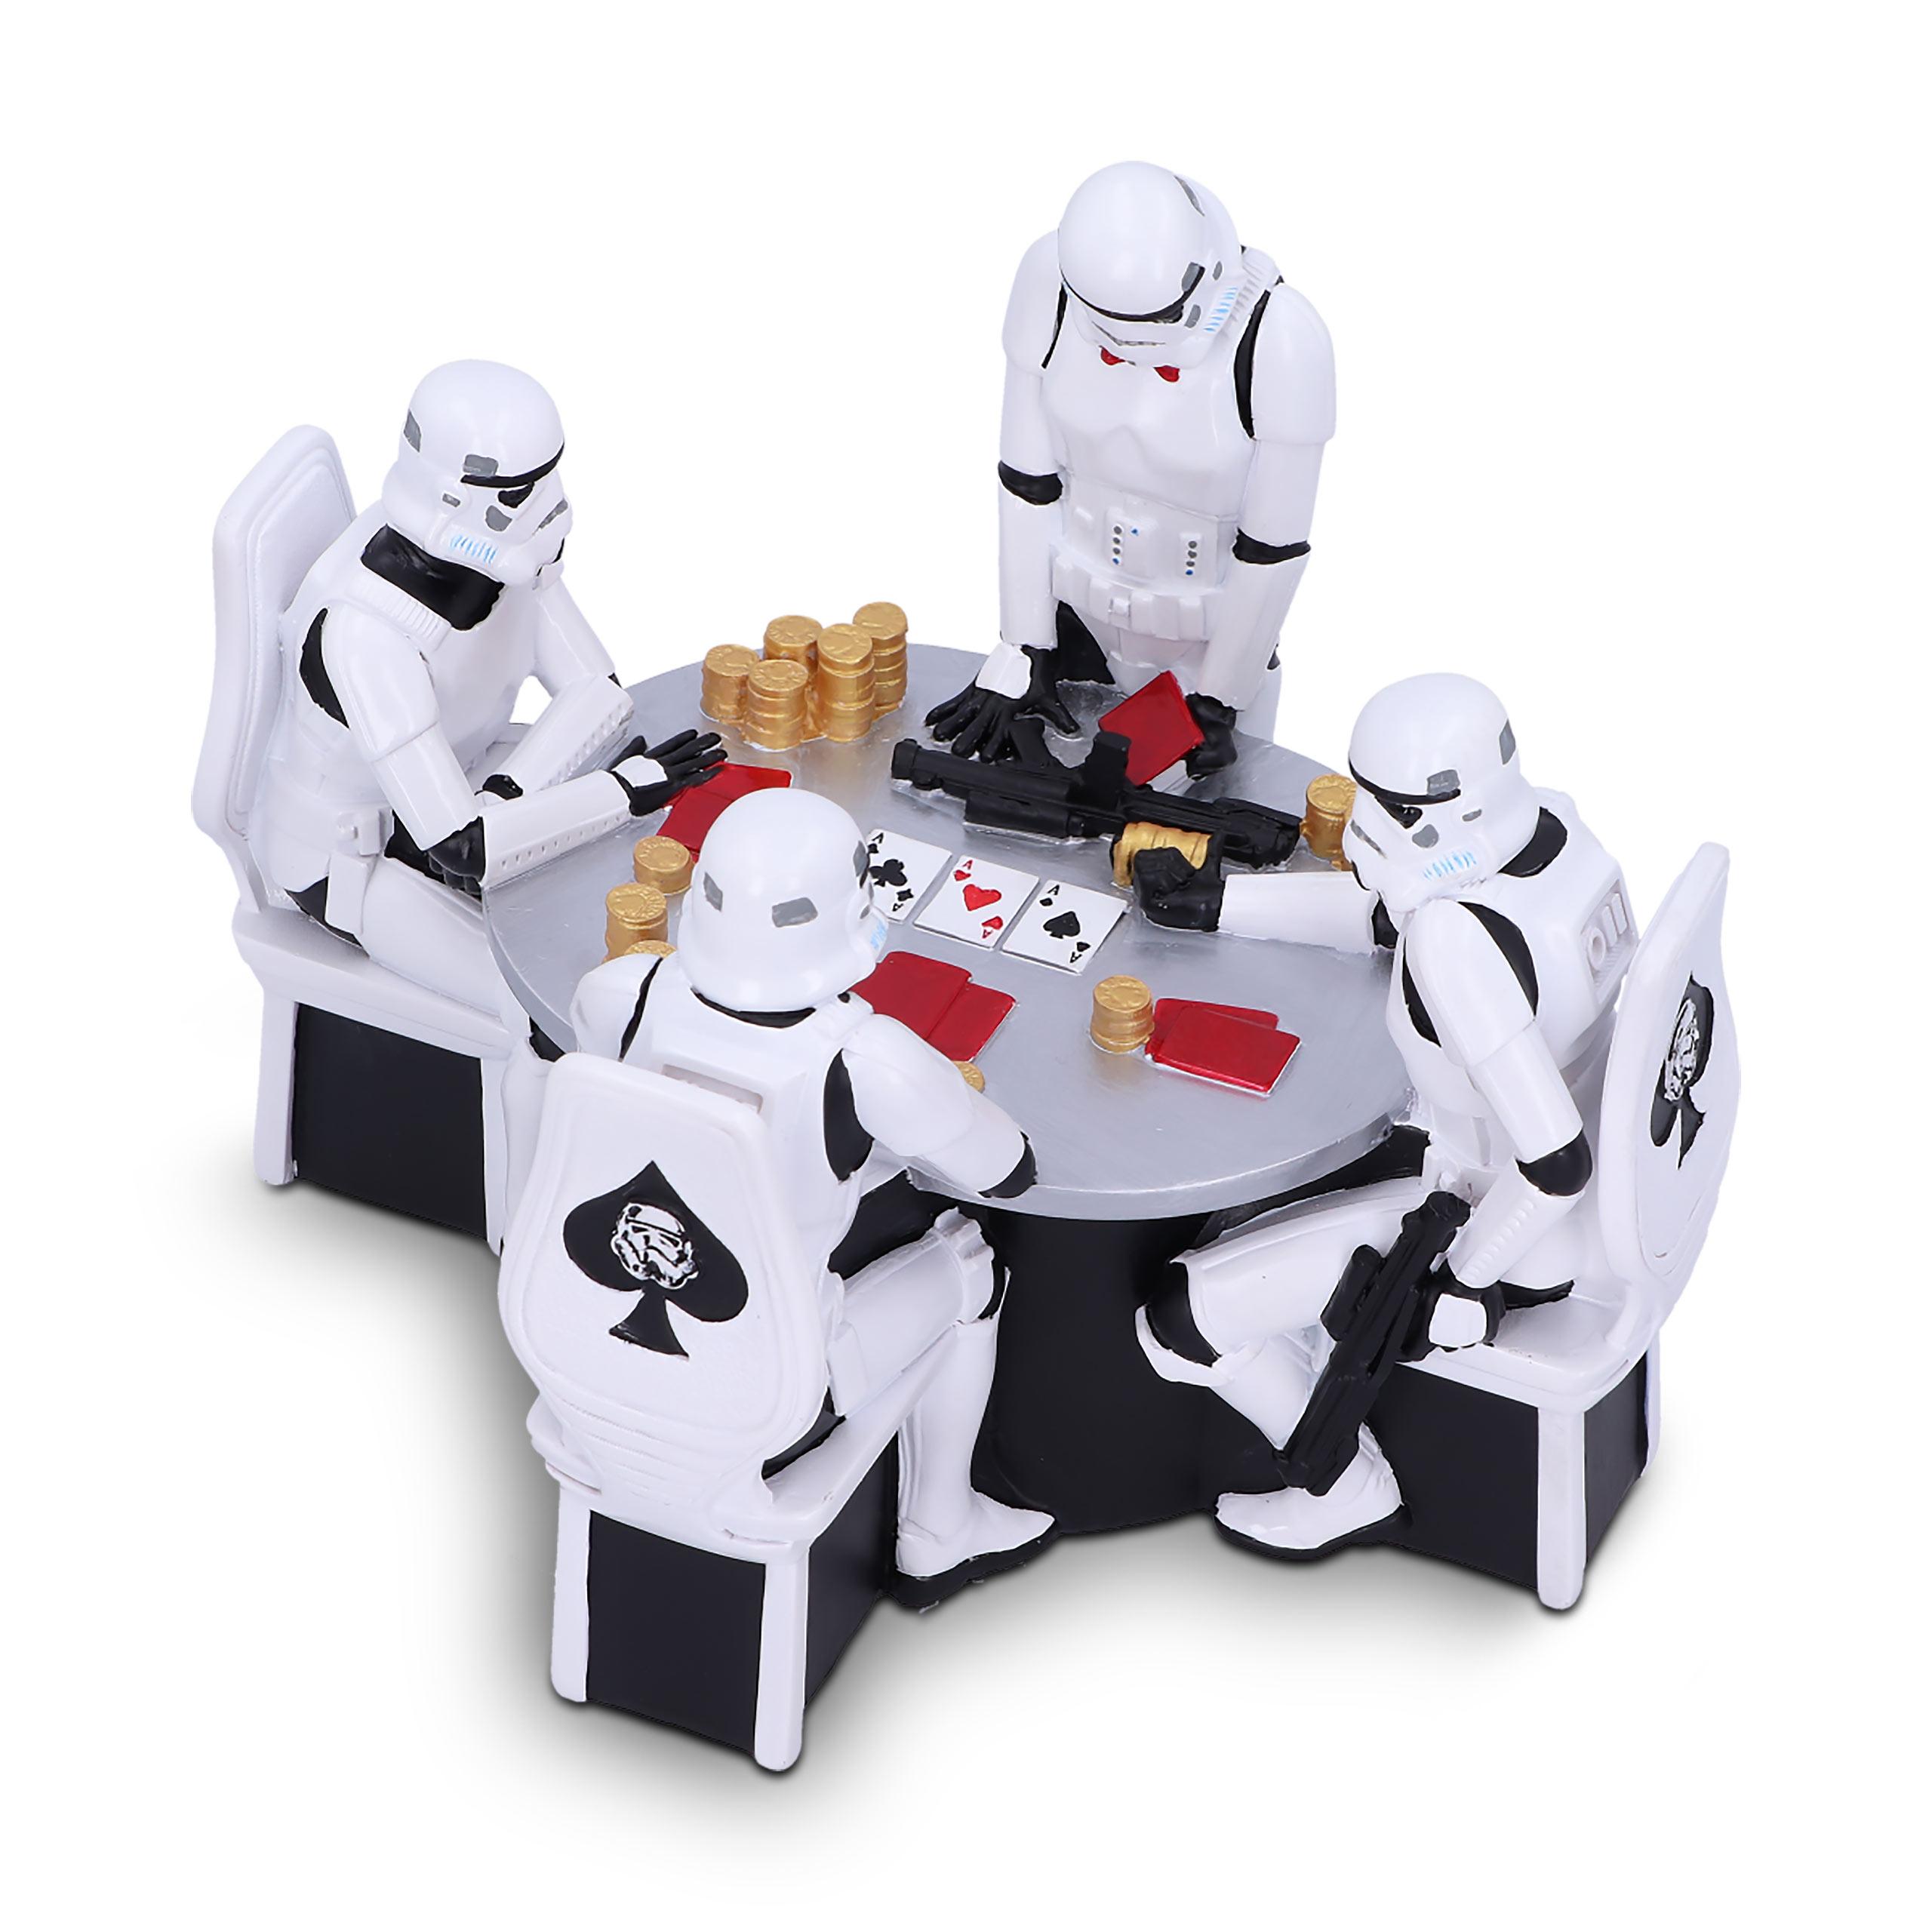 Original Stormtrooper Poker Face Diorama